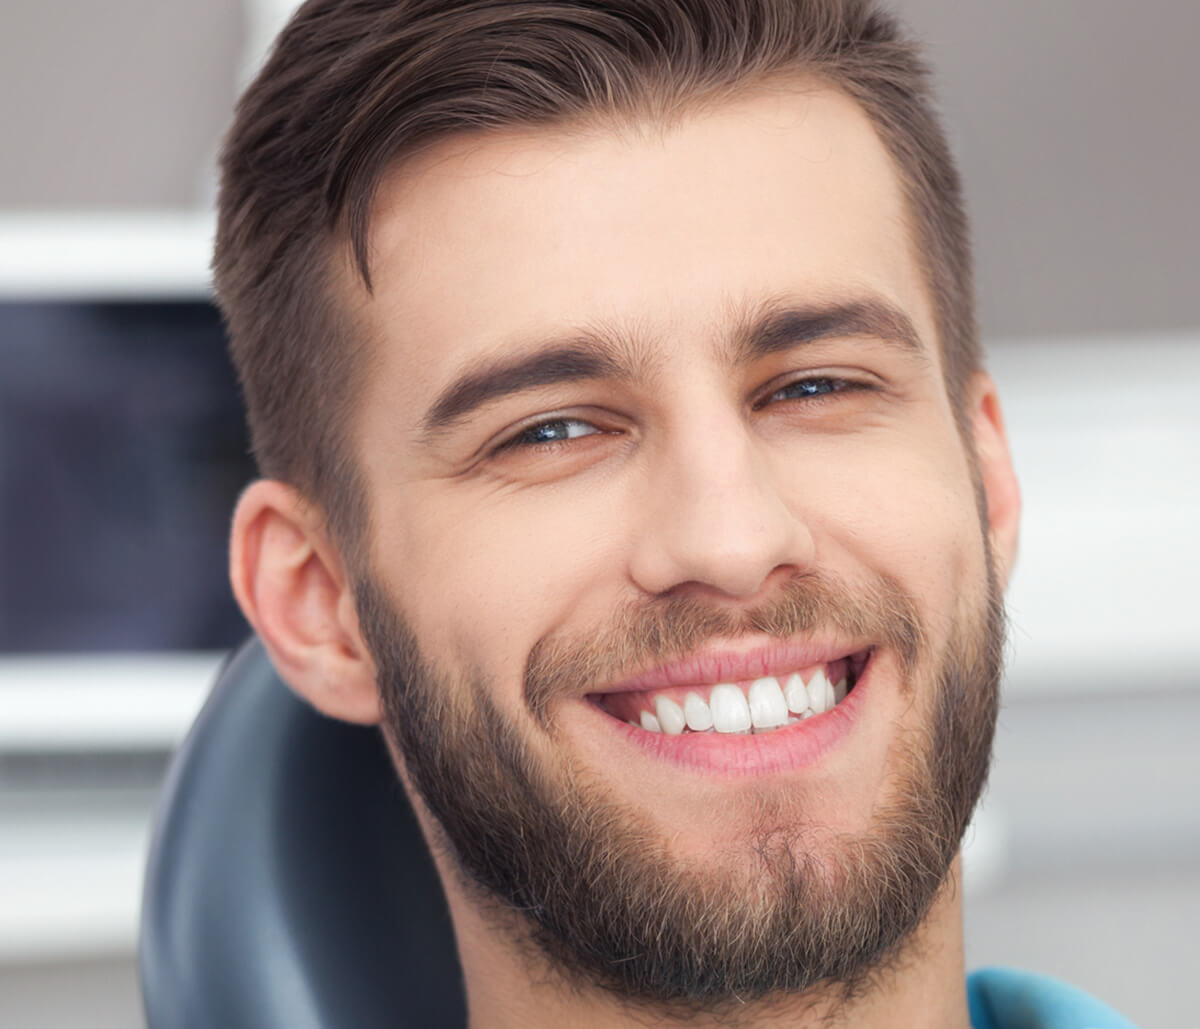 Teeth Implants Dentist in Houston Area